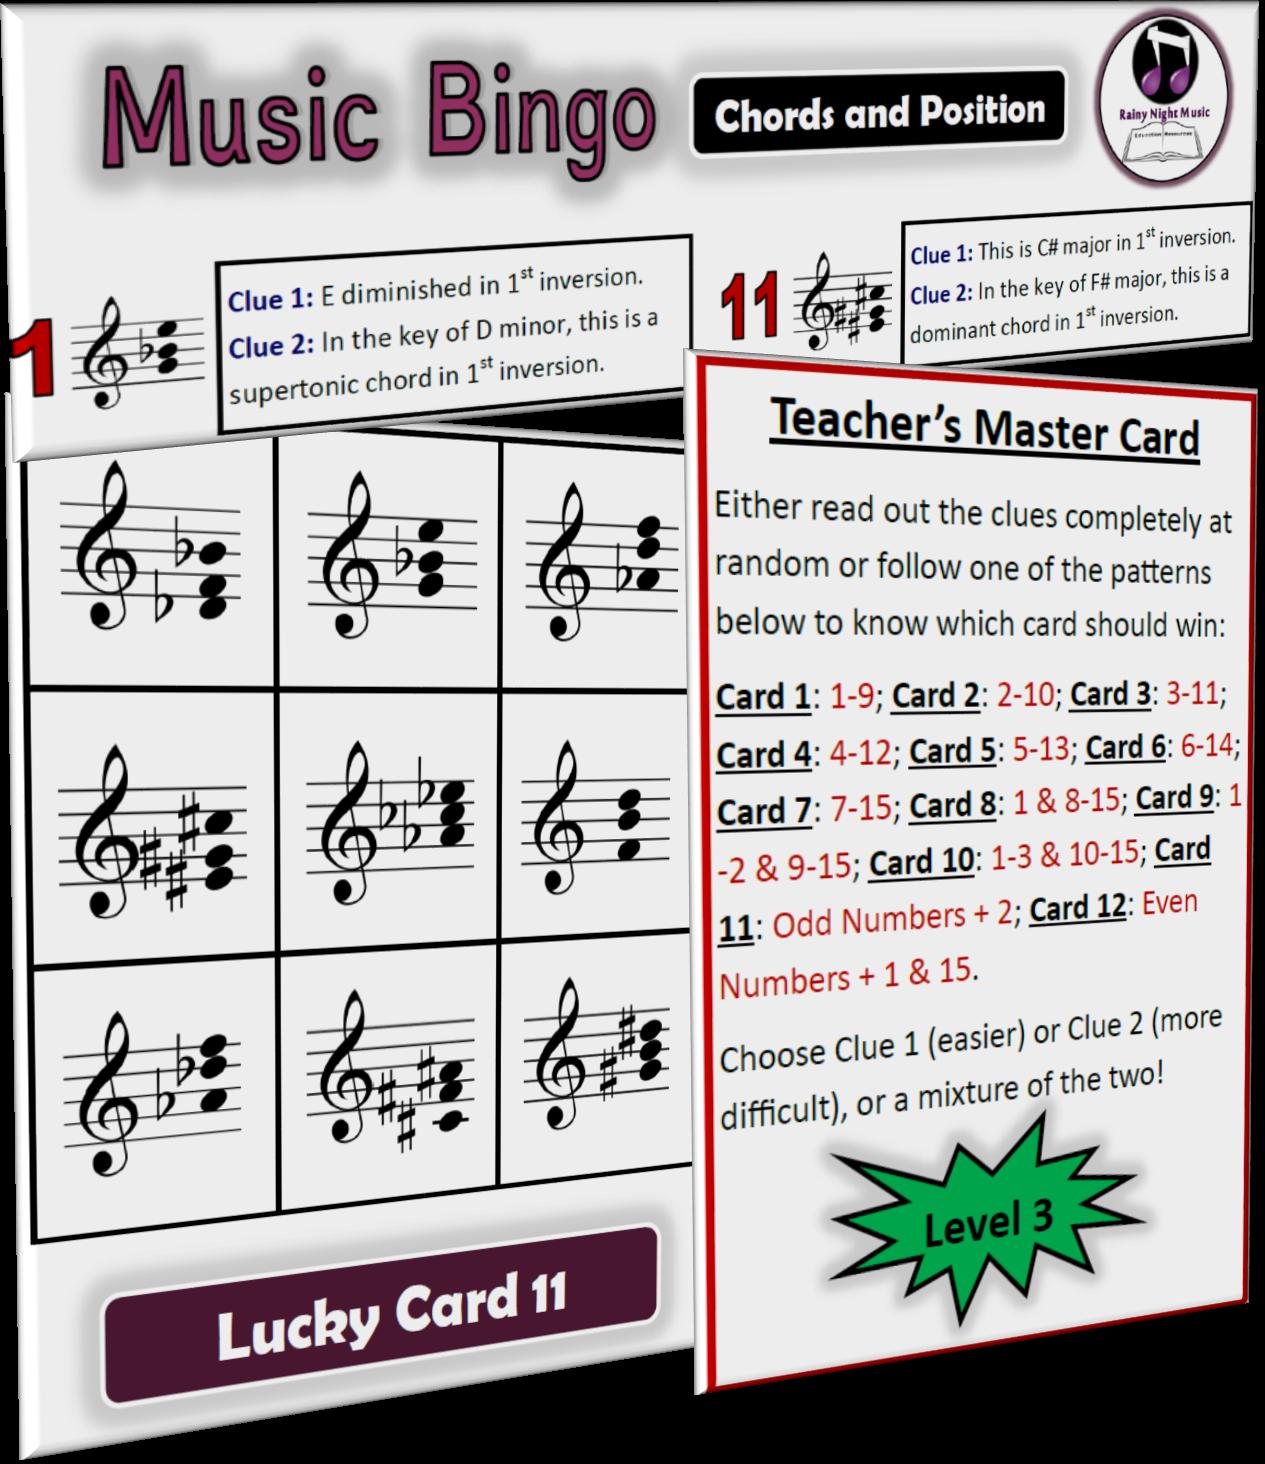 MUSIC BINGO Chords